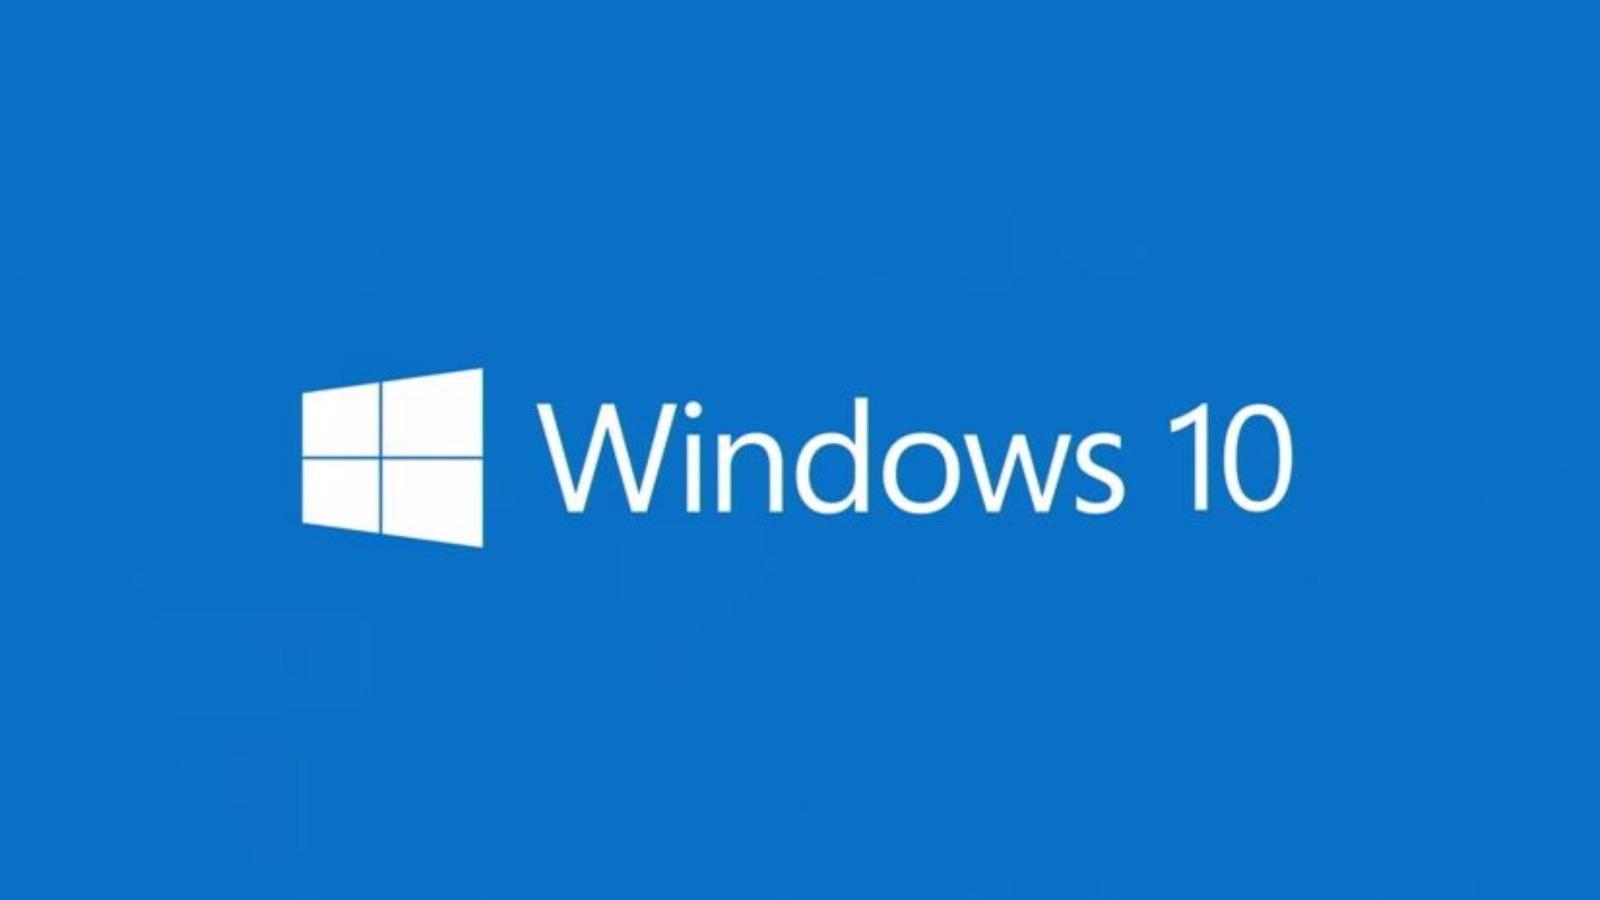 Download Wallpaper 1600x900 windows 10 technical preview windows 10 1600x900